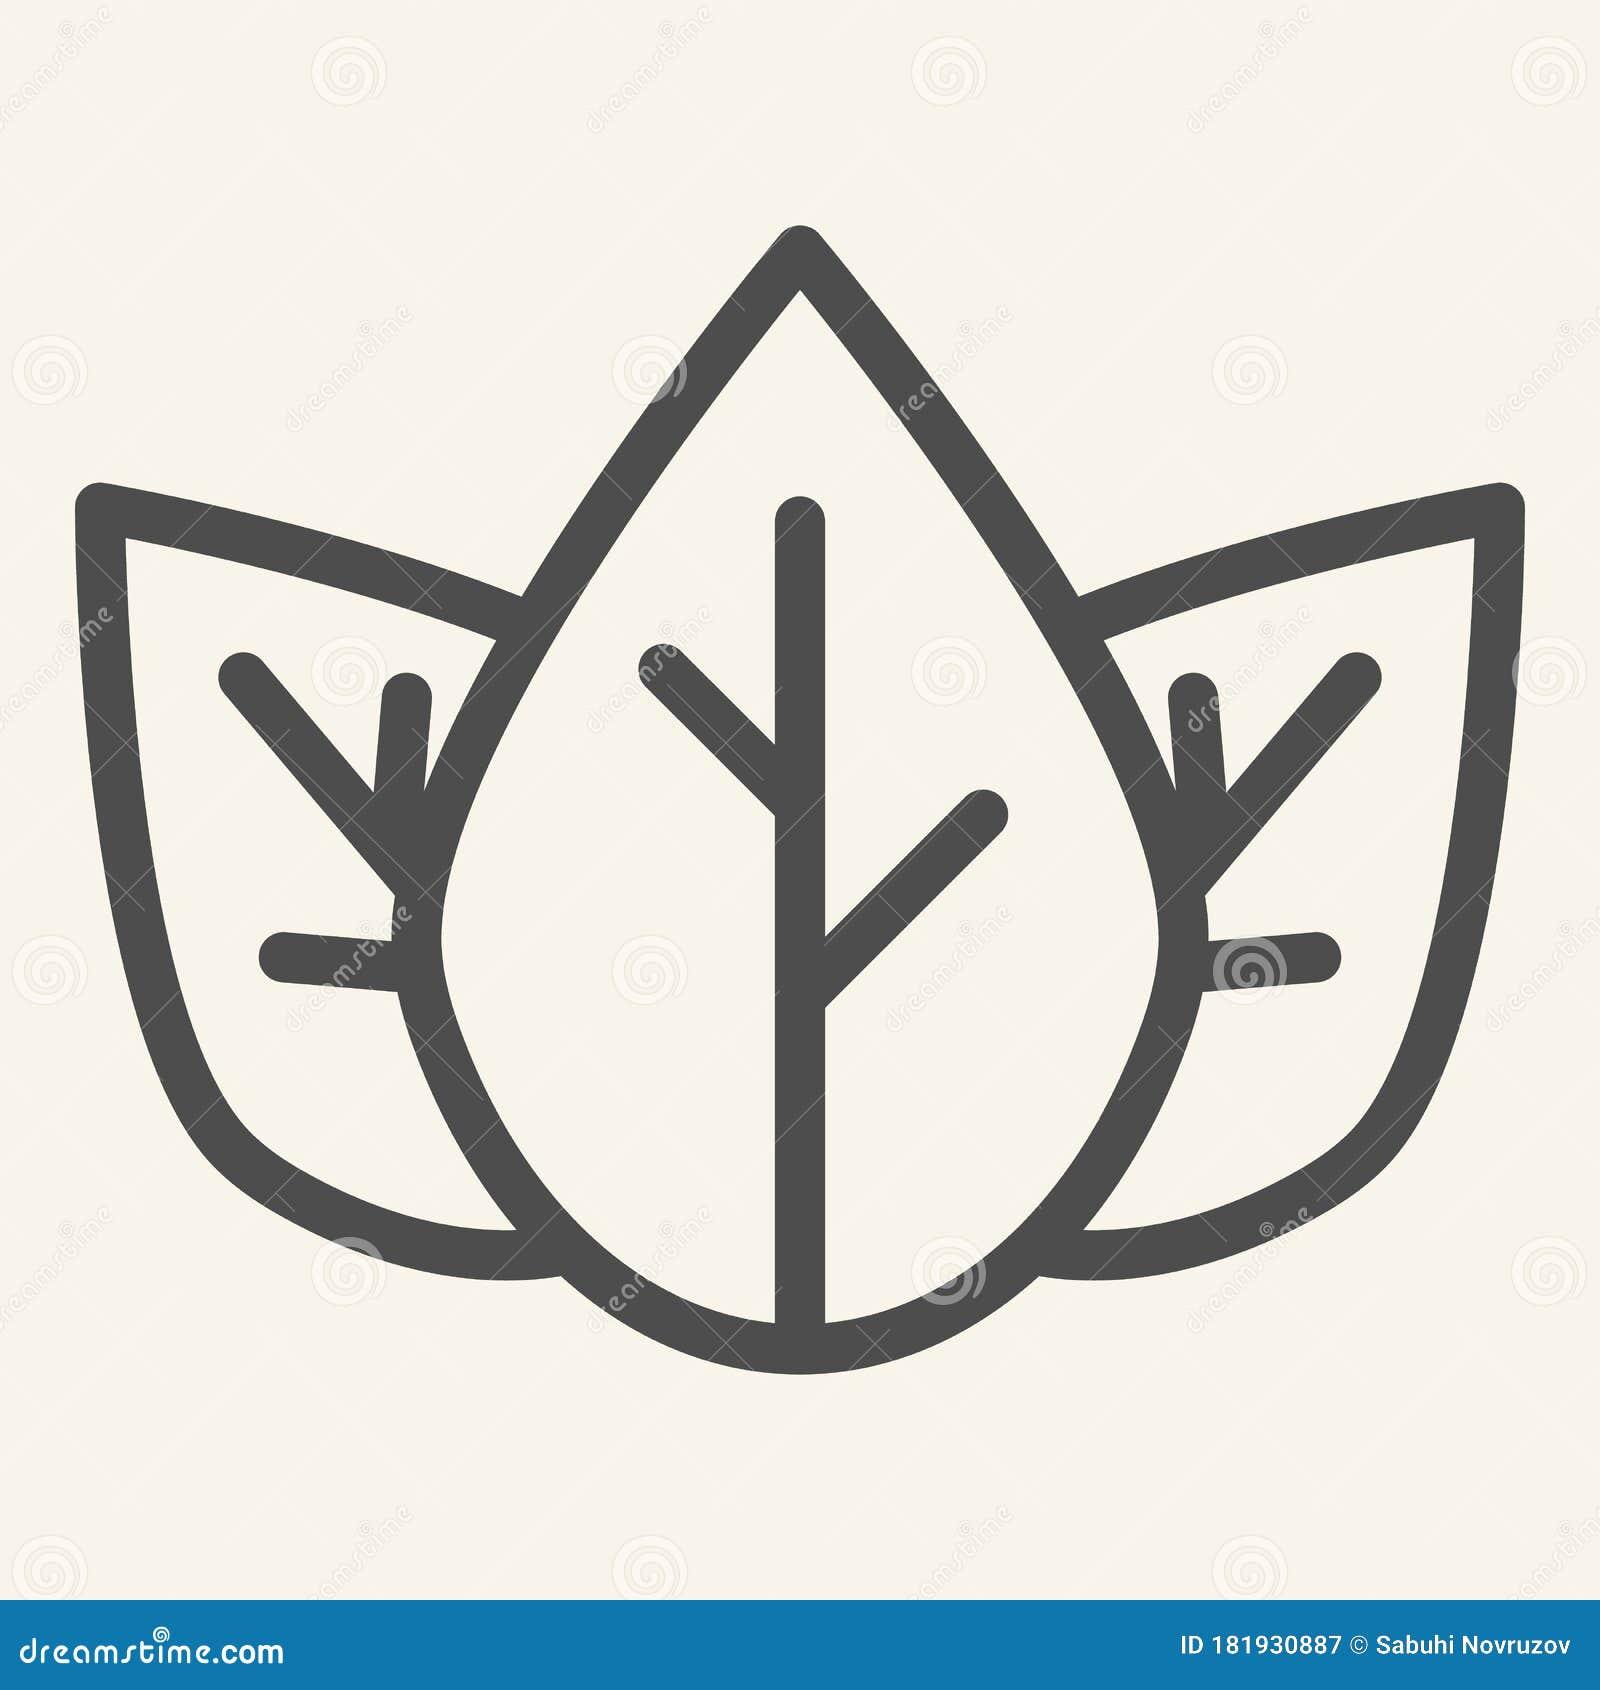 Mint Leaves Organic Logo Concept: Three Tea Leaves Line Icon. Spa And Organic Symbol